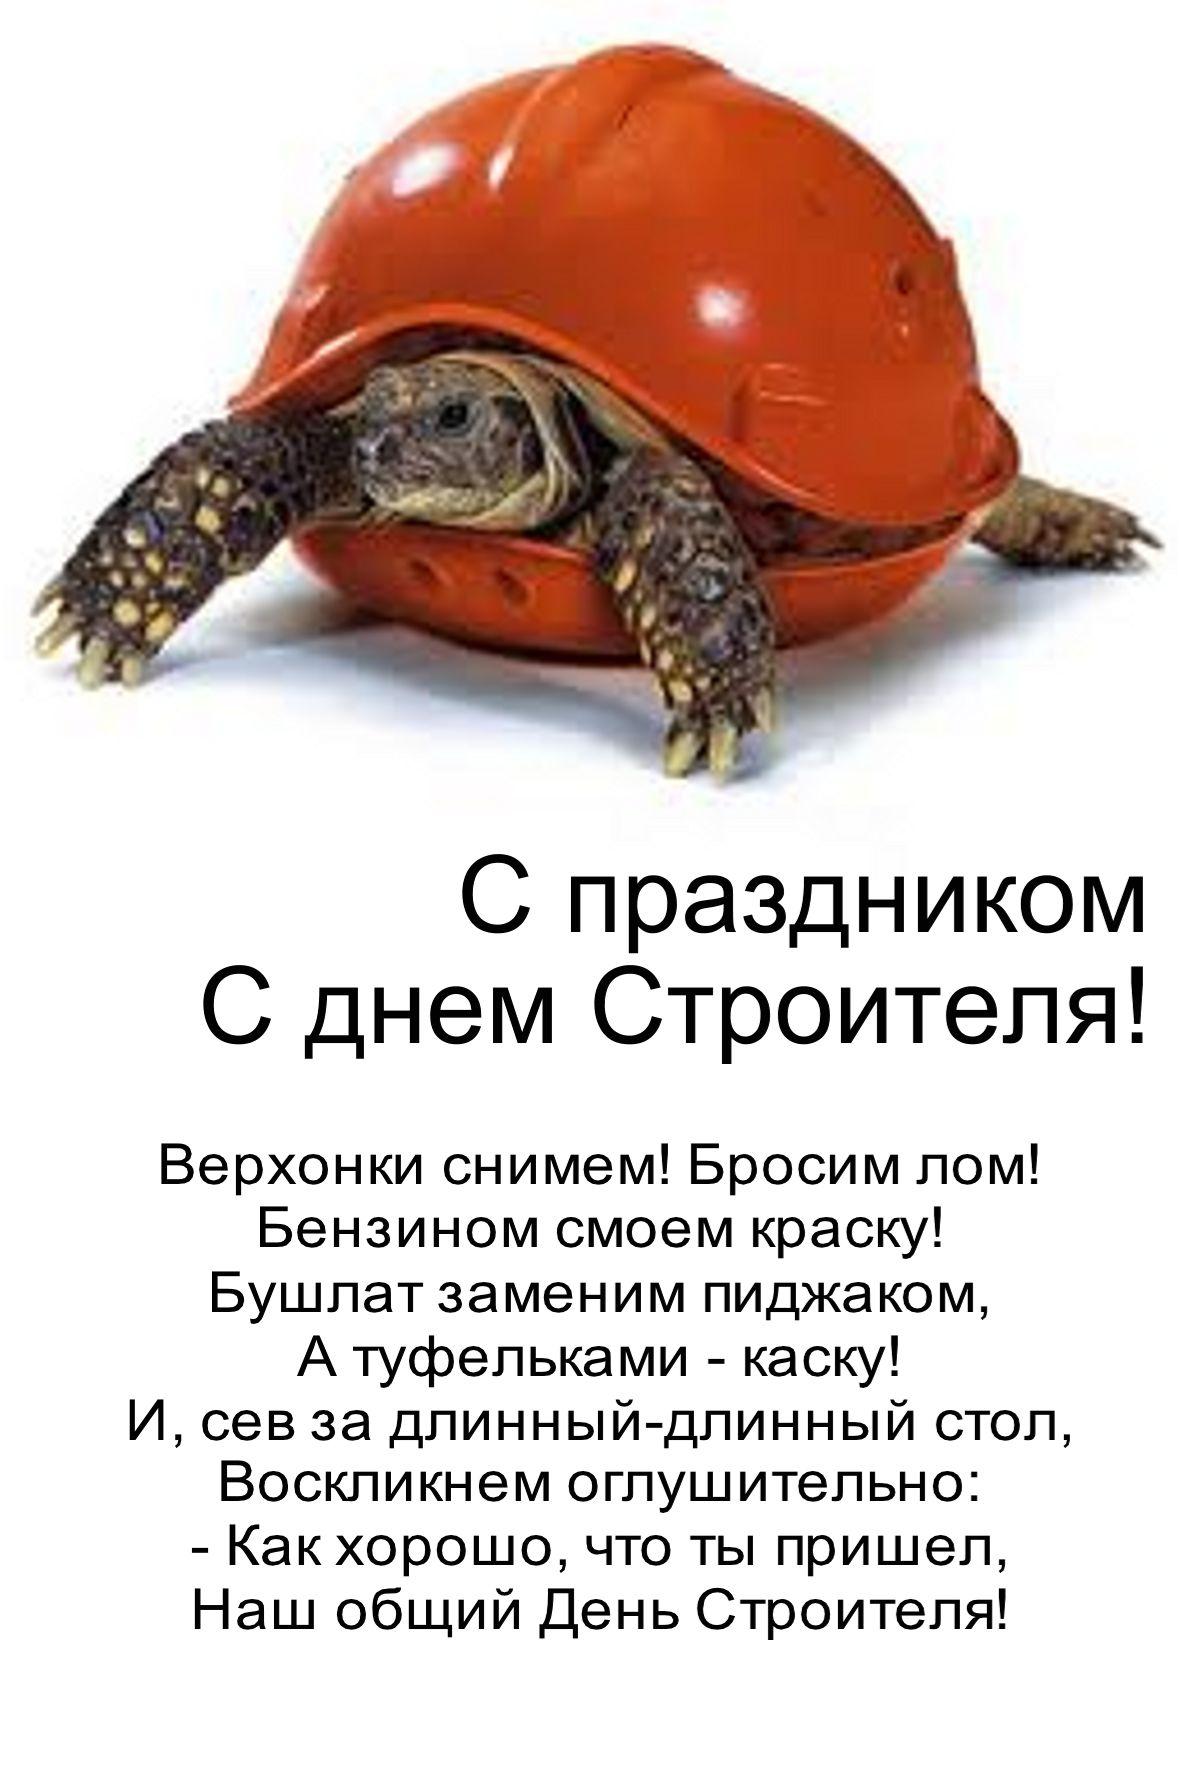 http://www.pra3dnuk.ru/foto/1/stroit_9.jpg